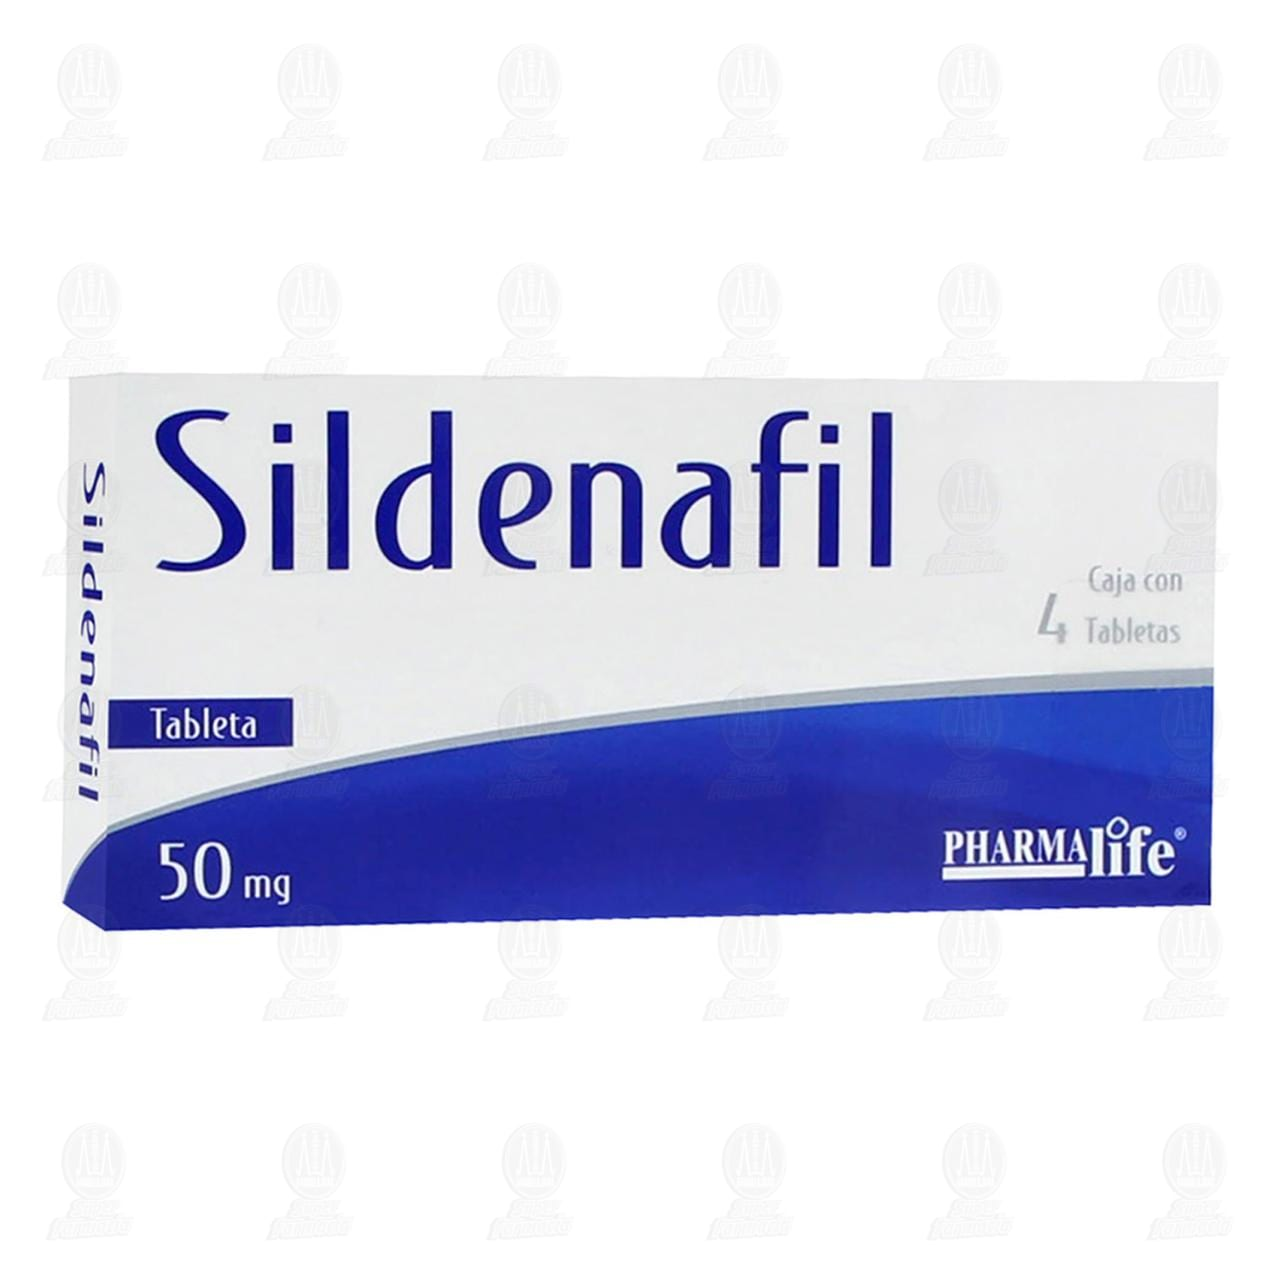 Comprar Sildenafil 50mg 4 Tabletas en Farmacias Guadalajara